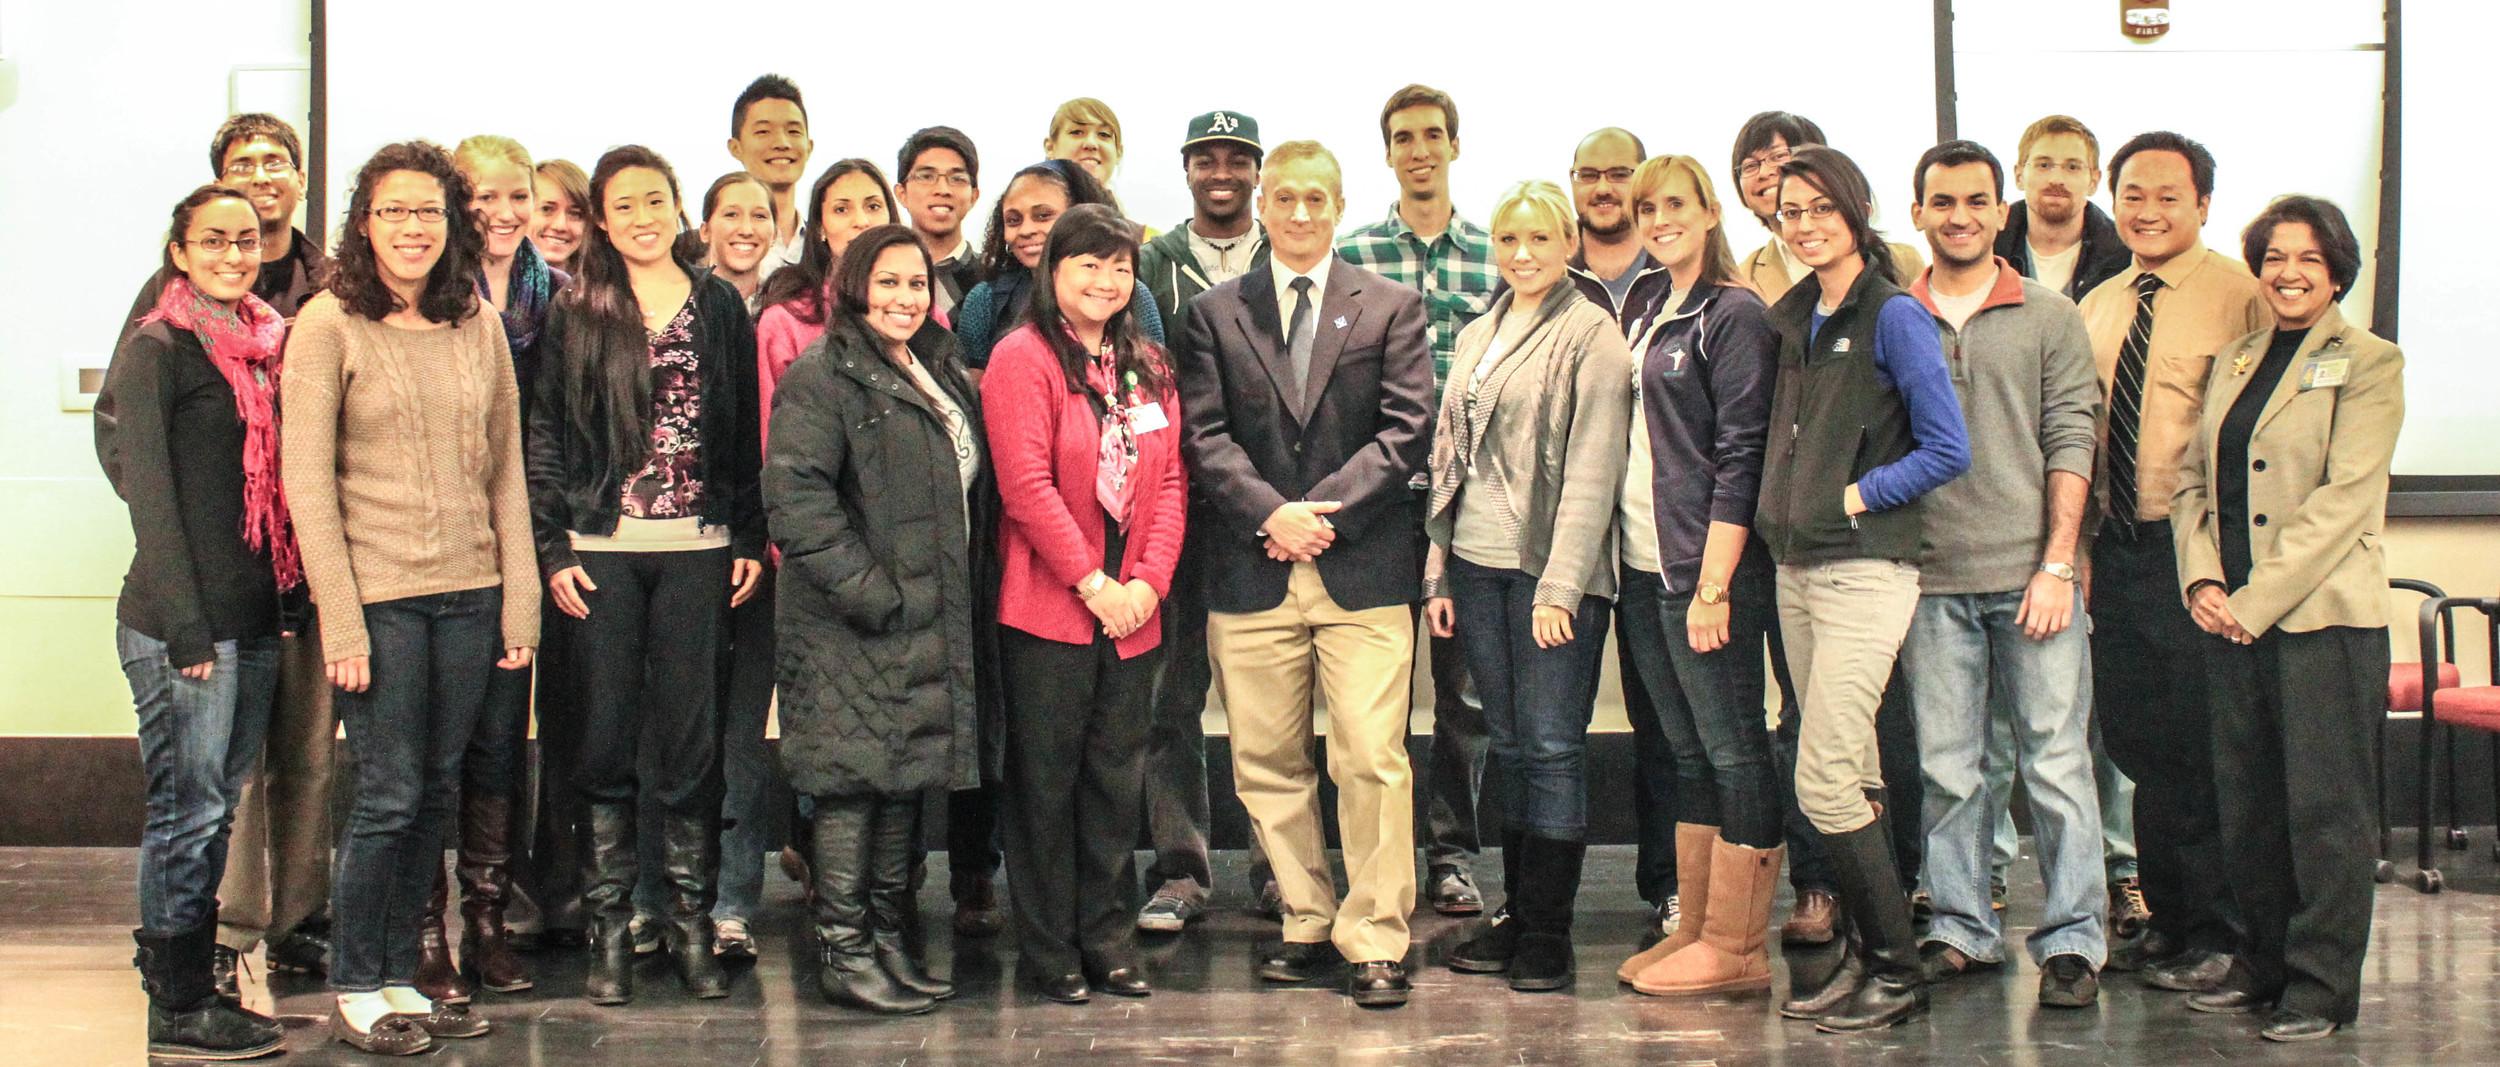 Students Bring Street Medicine Institute Founder to SOM (WSUSOM E-News) - Jan 2, 2013